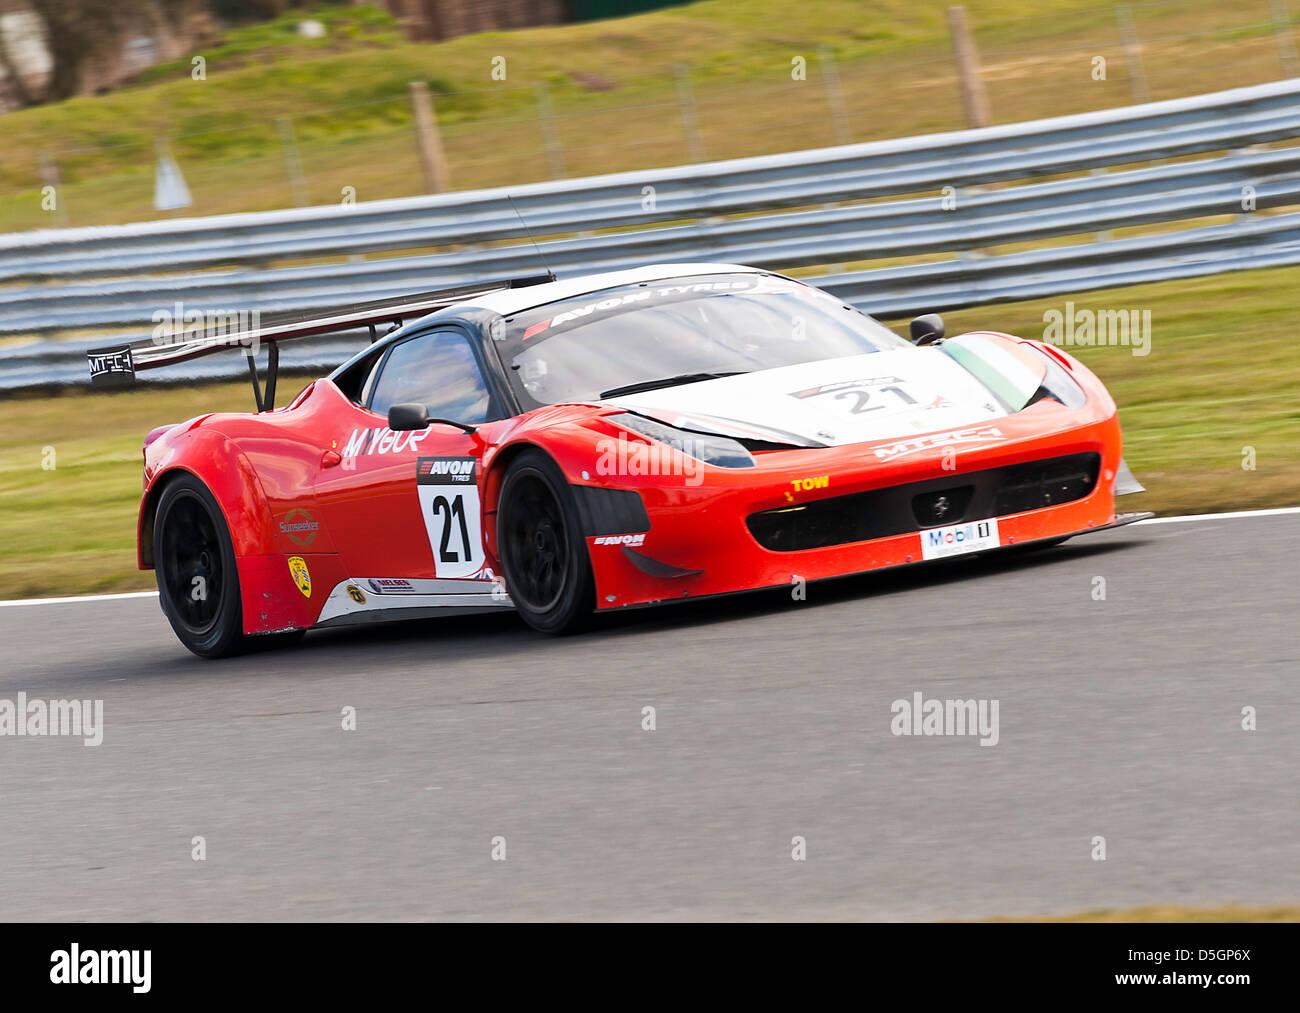 Ferrari 458 Italia Gt3 Sports Car In British Gt Championship At Stock Photo Alamy